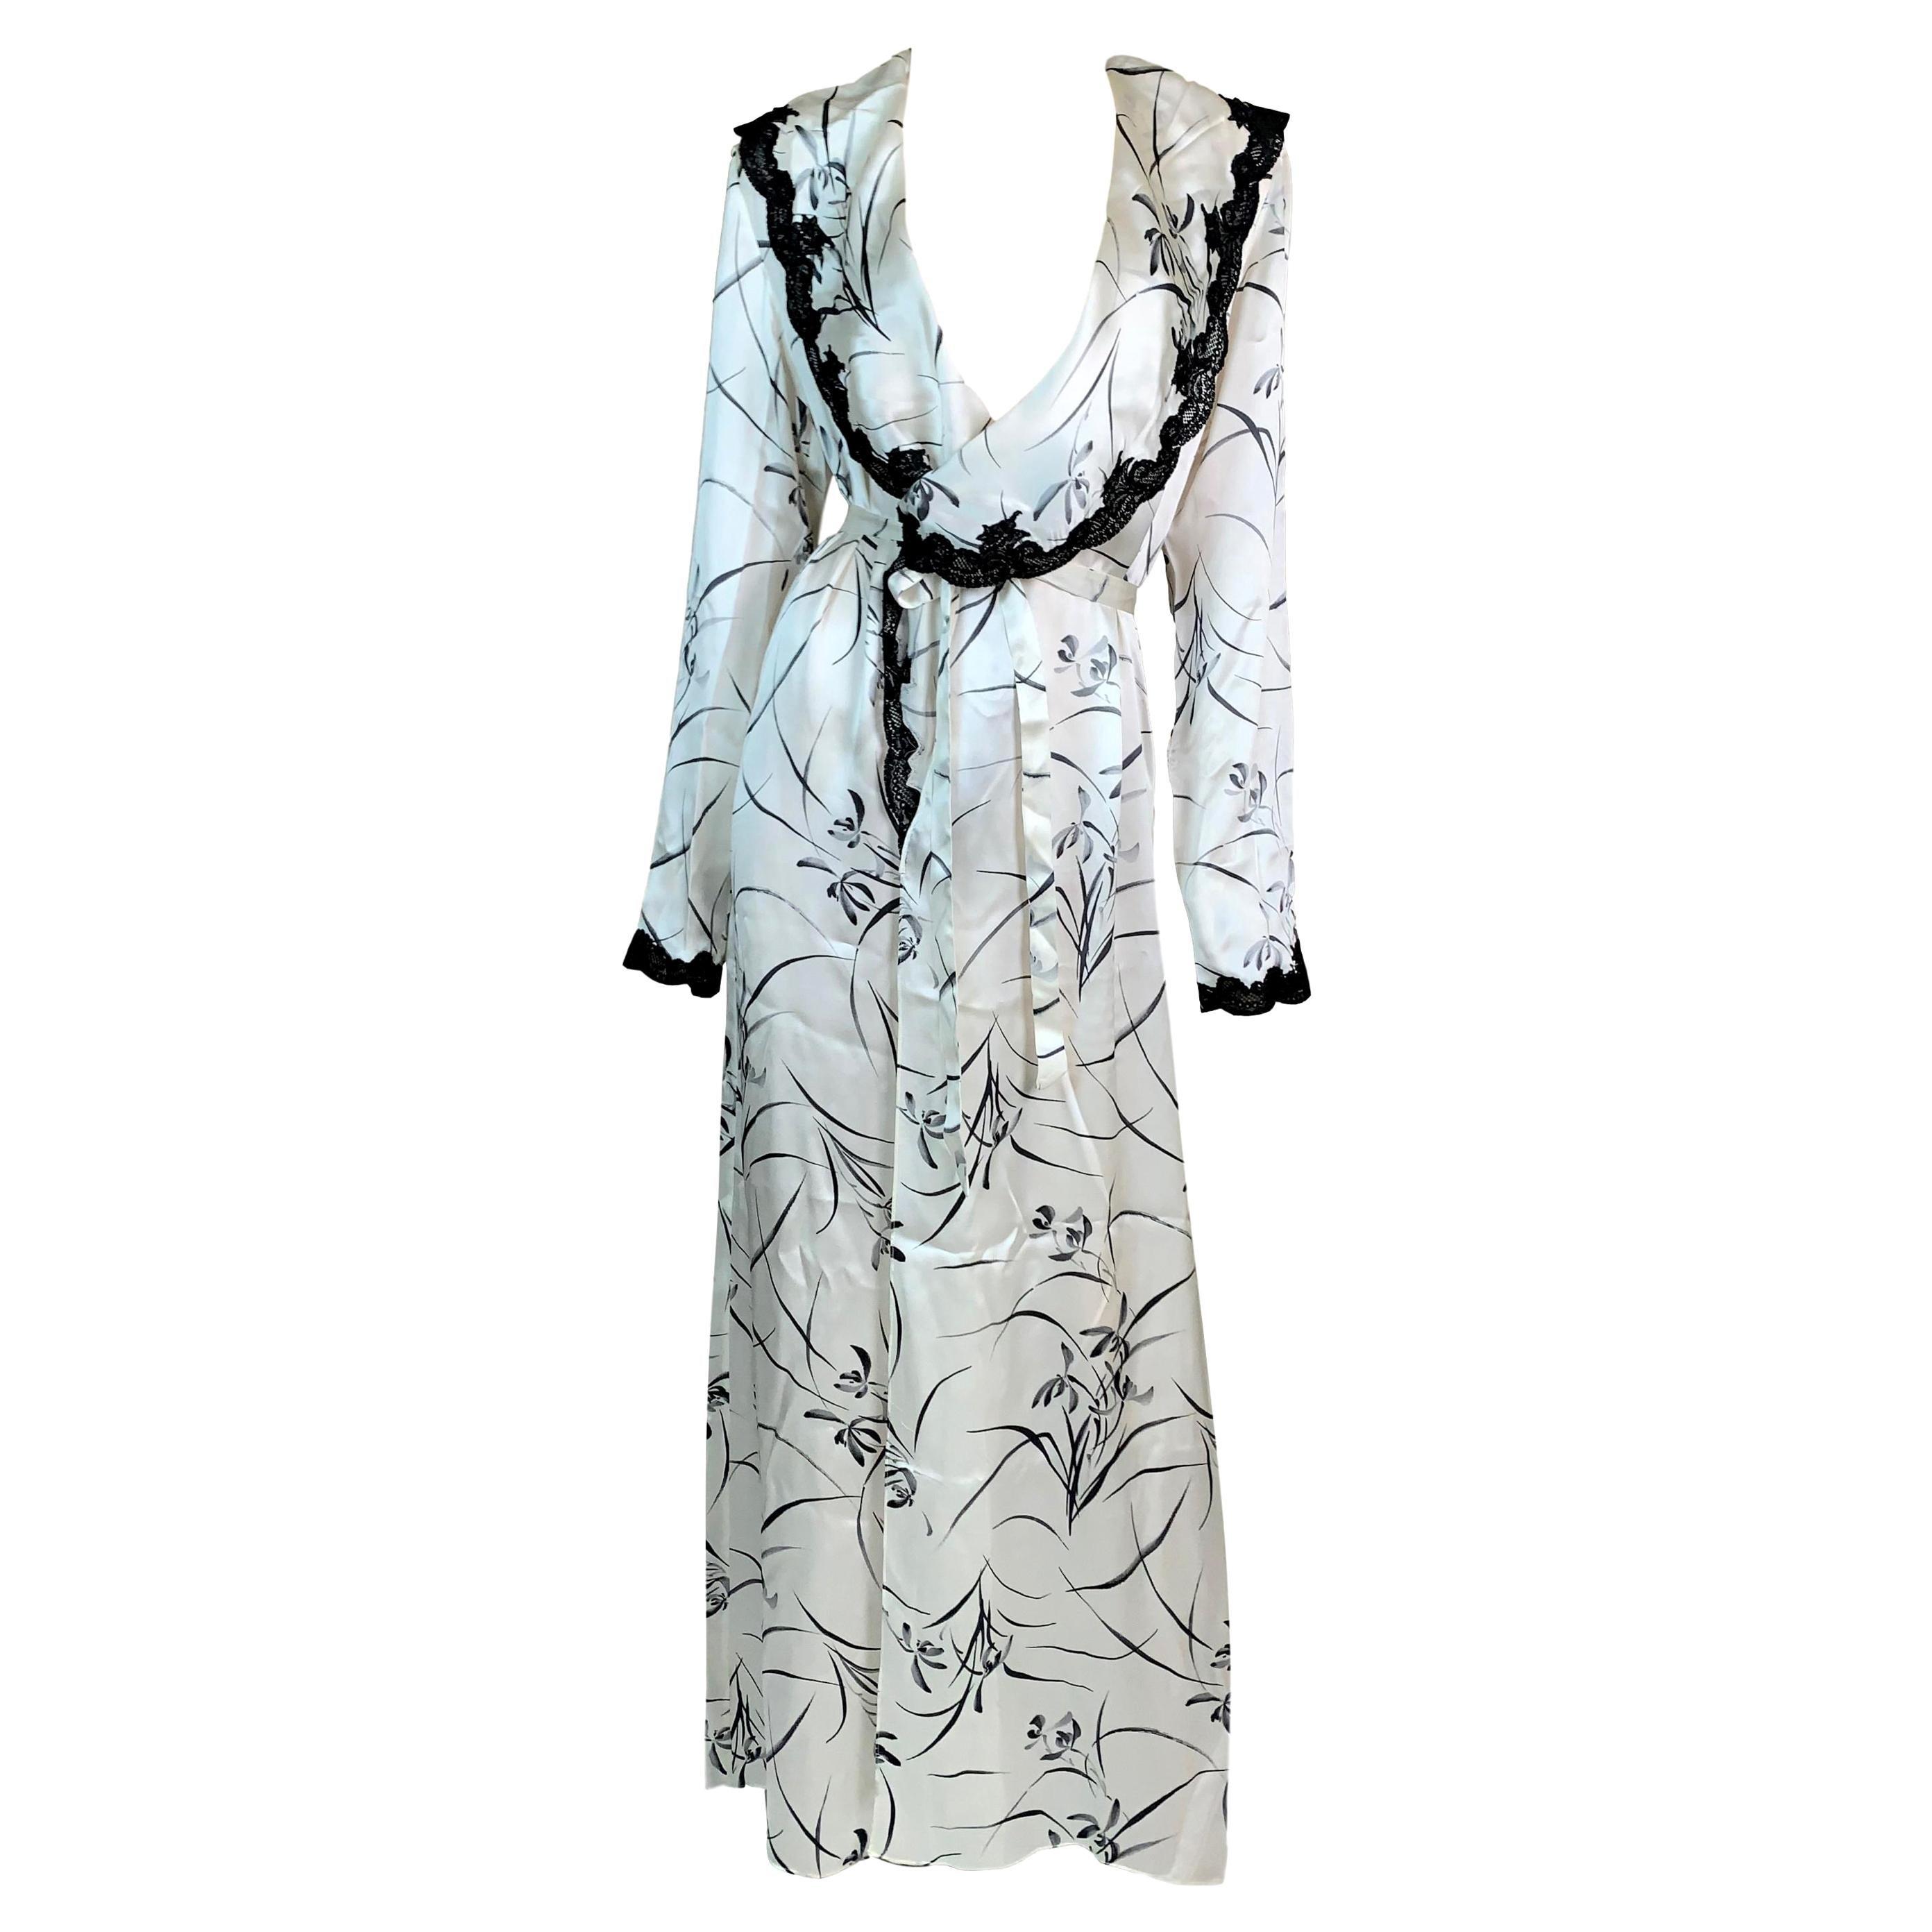 2000's Christian Dior John Galliano Old Hollywood Silk Black & White Dress Robe